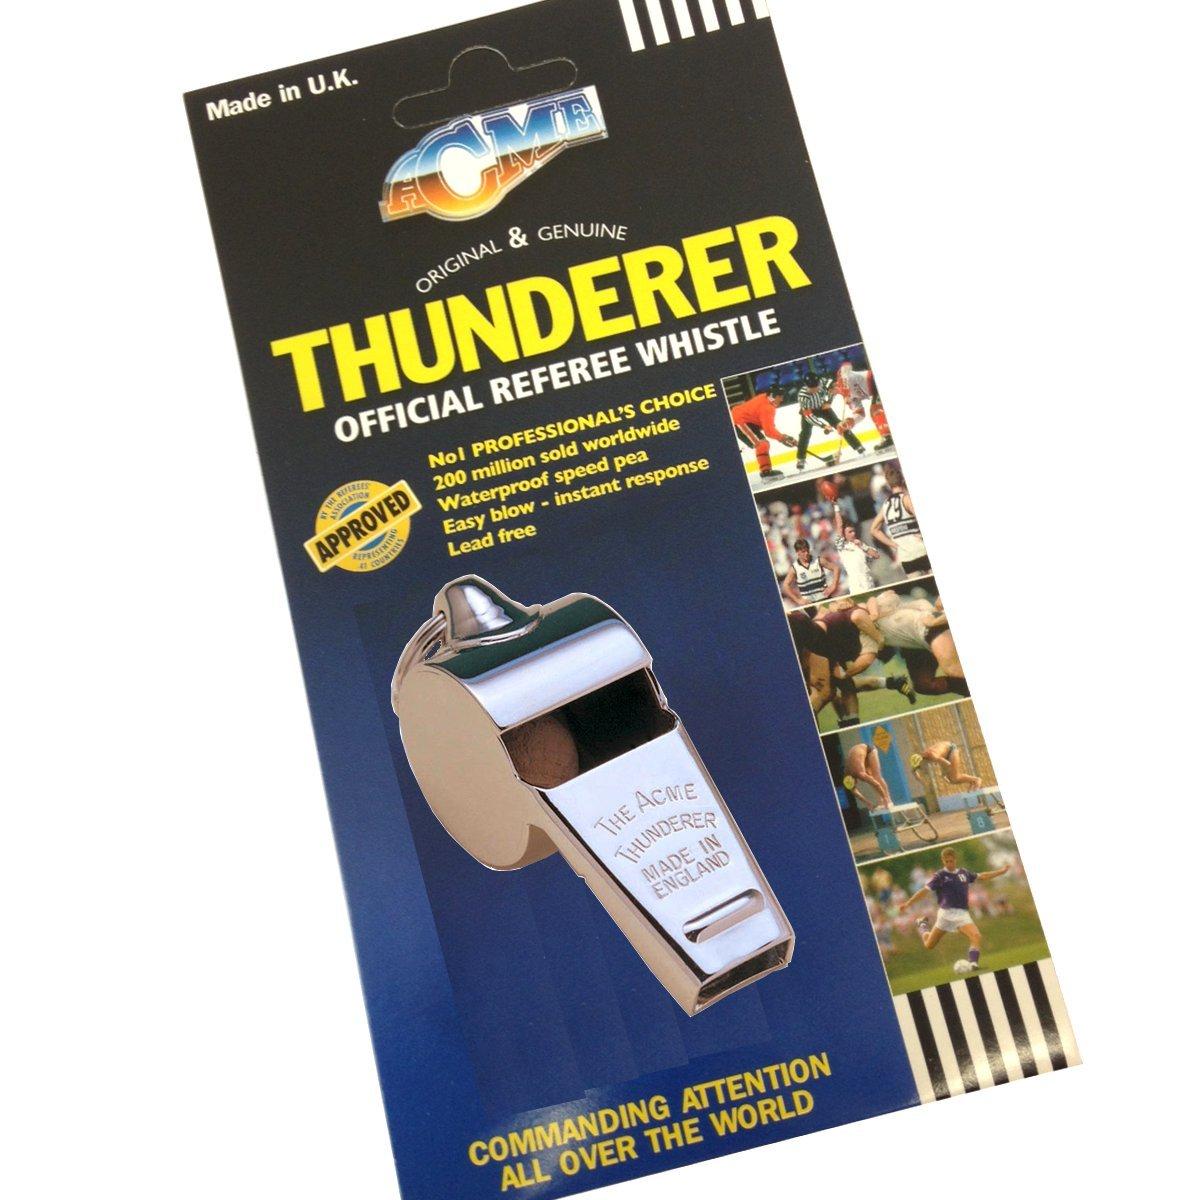 Acme Thunderer 60.5 Official Referee whistle - football hockey rugby referee whistle by Thunderer